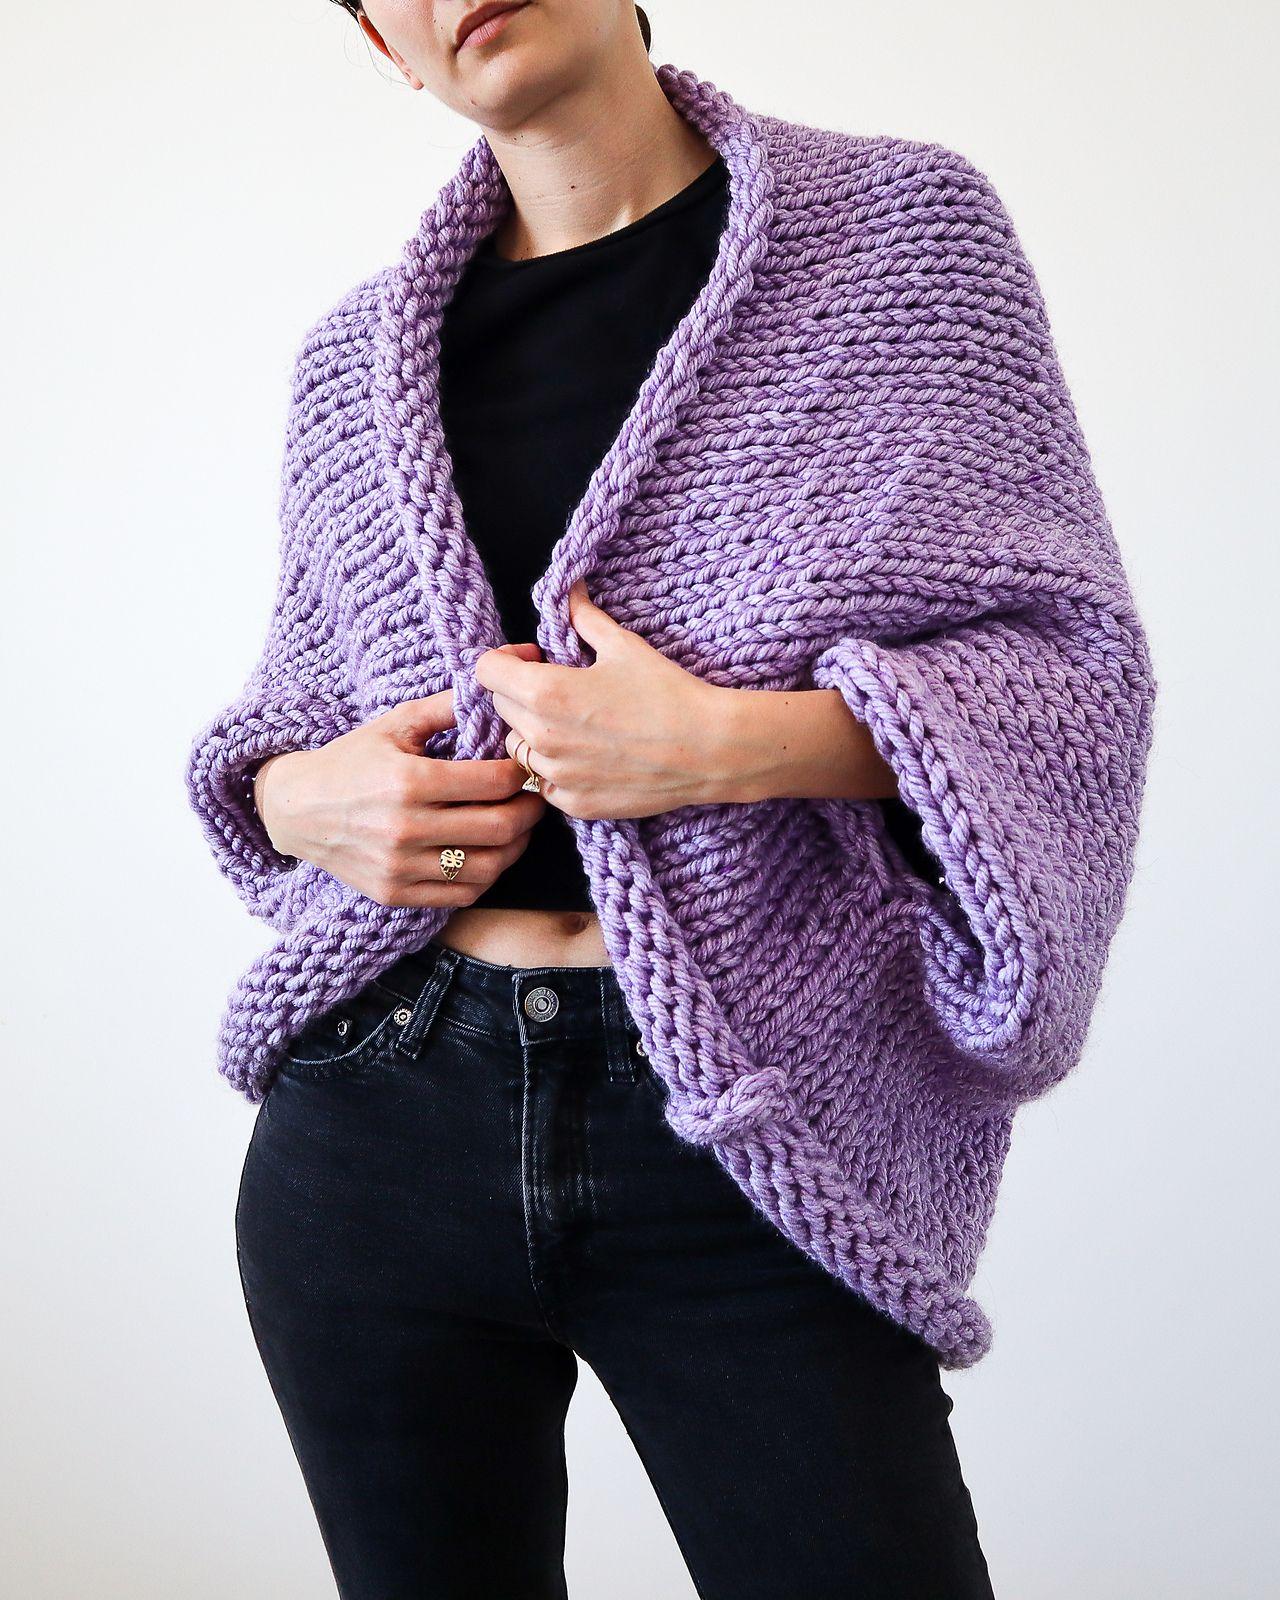 Super Chunky Slouchy Shrug in 2020   Shrug knitting ...